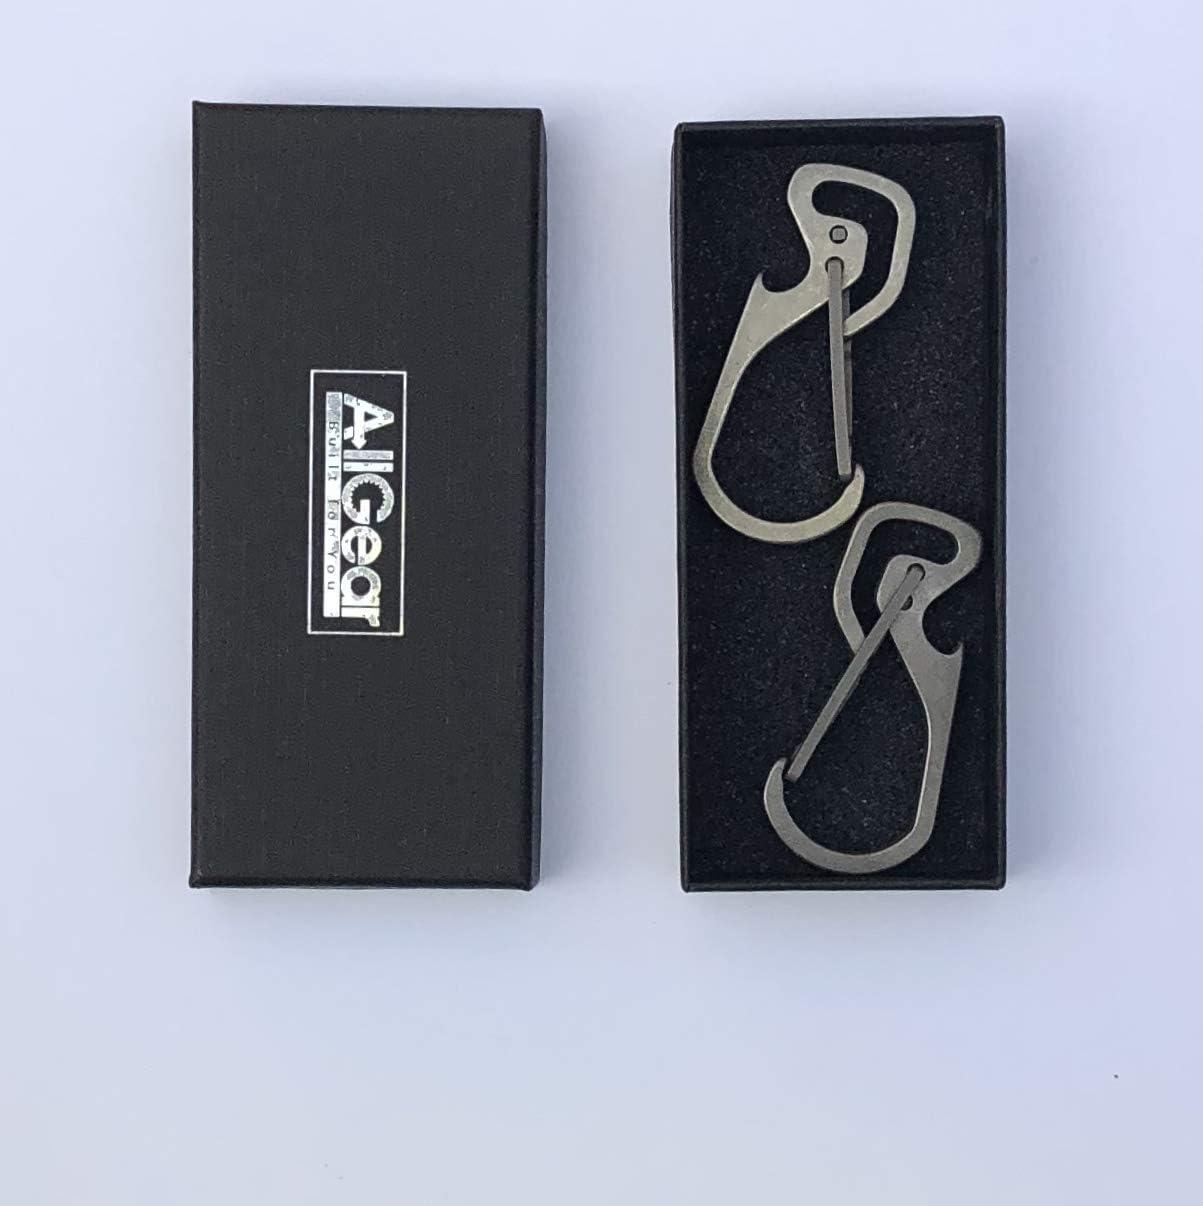 AllGear 2-Pack, Titanium Carabiner Key Chain Holder, Bottle Opener with Quick Release Multi-Tool